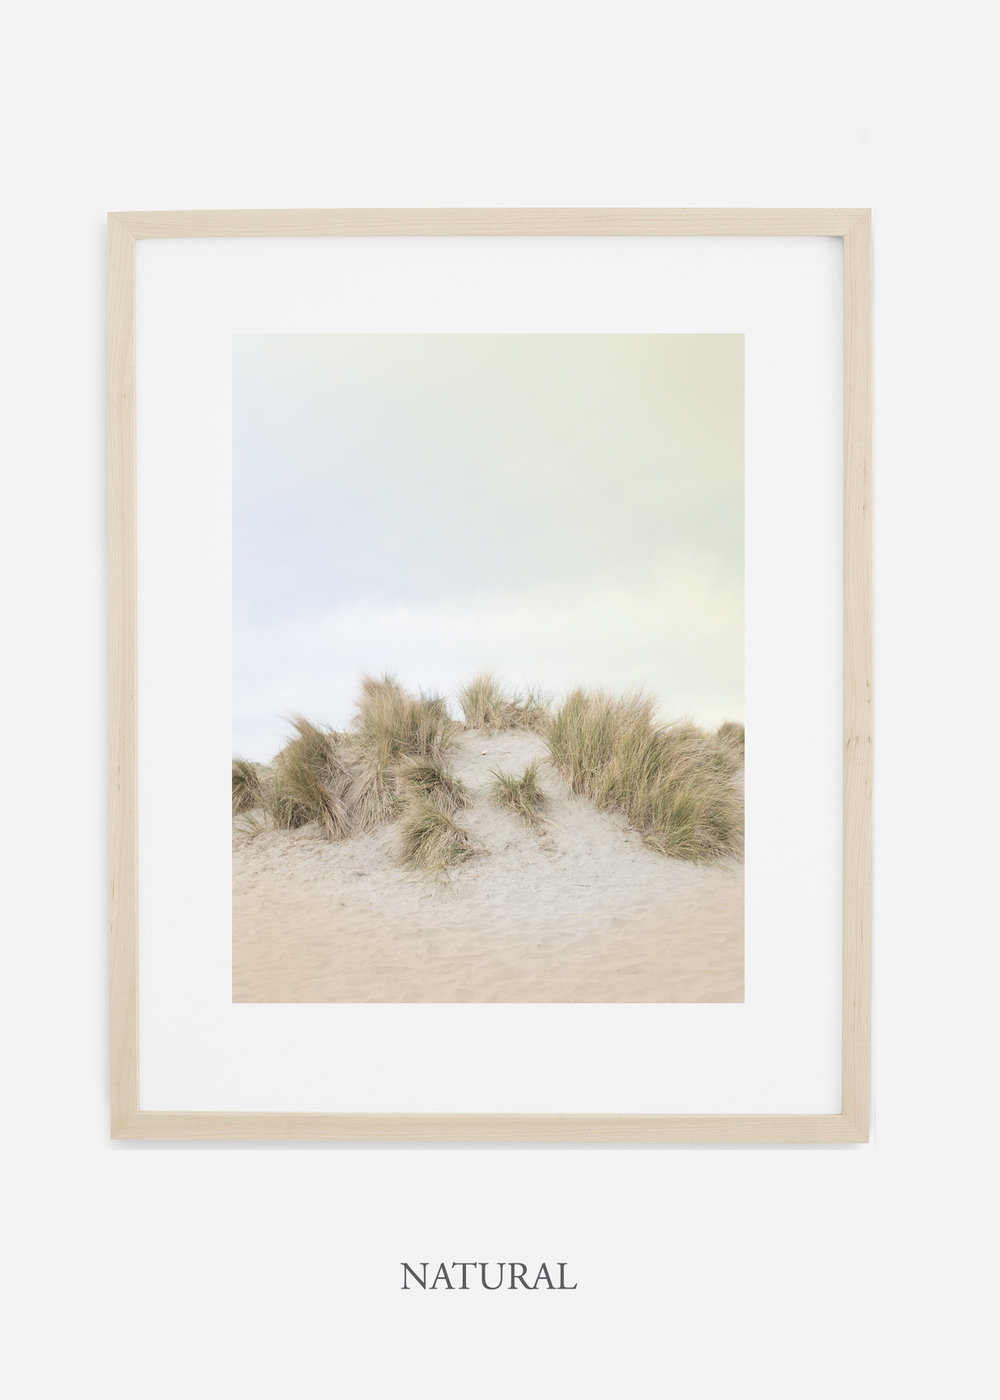 DunesNo.2_naturalframe_BigSur_Ocean_Beach__Art_Photography_interiordesign_bohemian_cactusart.jpg